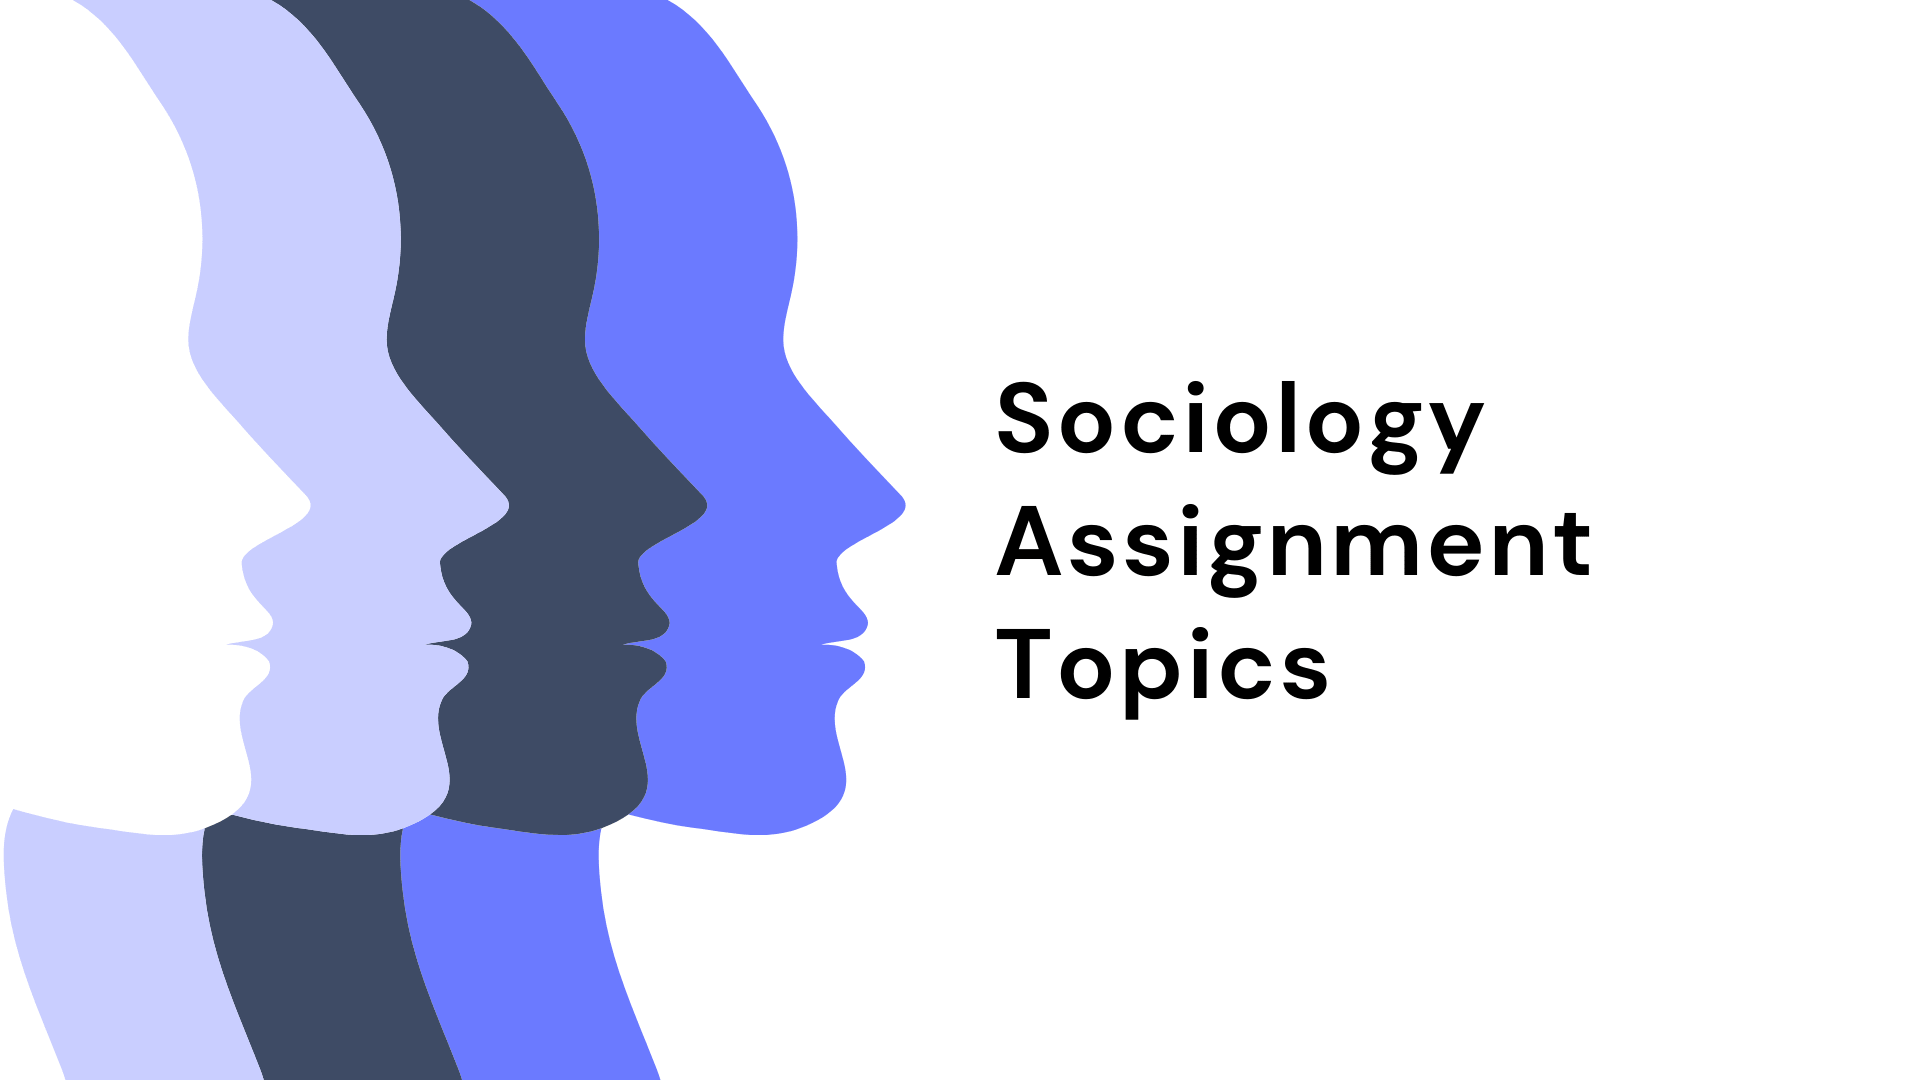 Sociology Assignment Topics